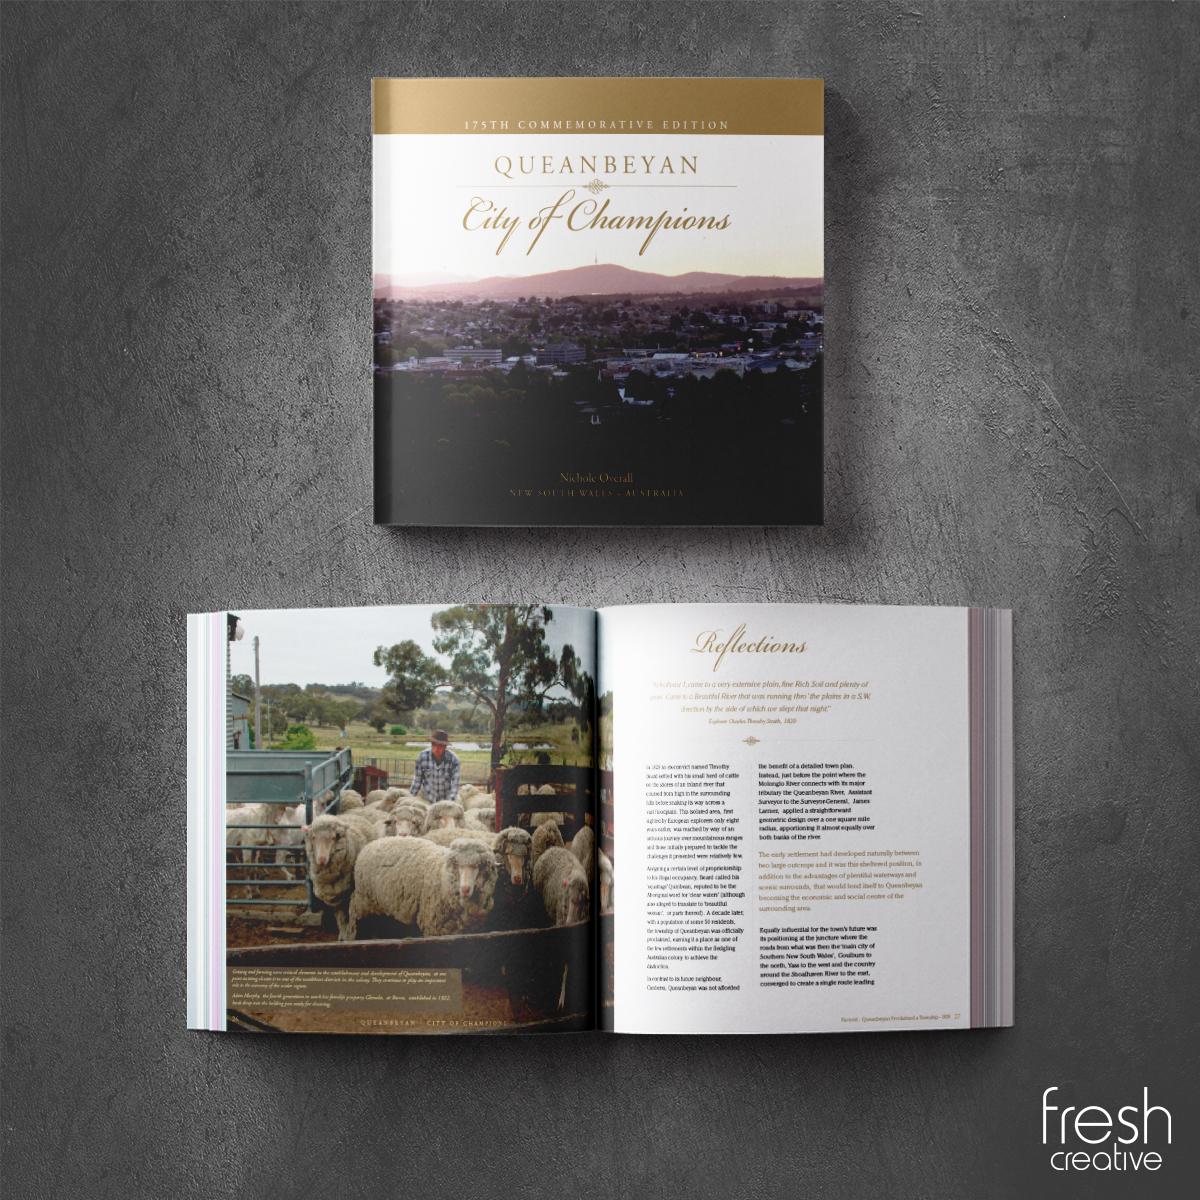 Custom Made Queanbeyan City of Champions Book